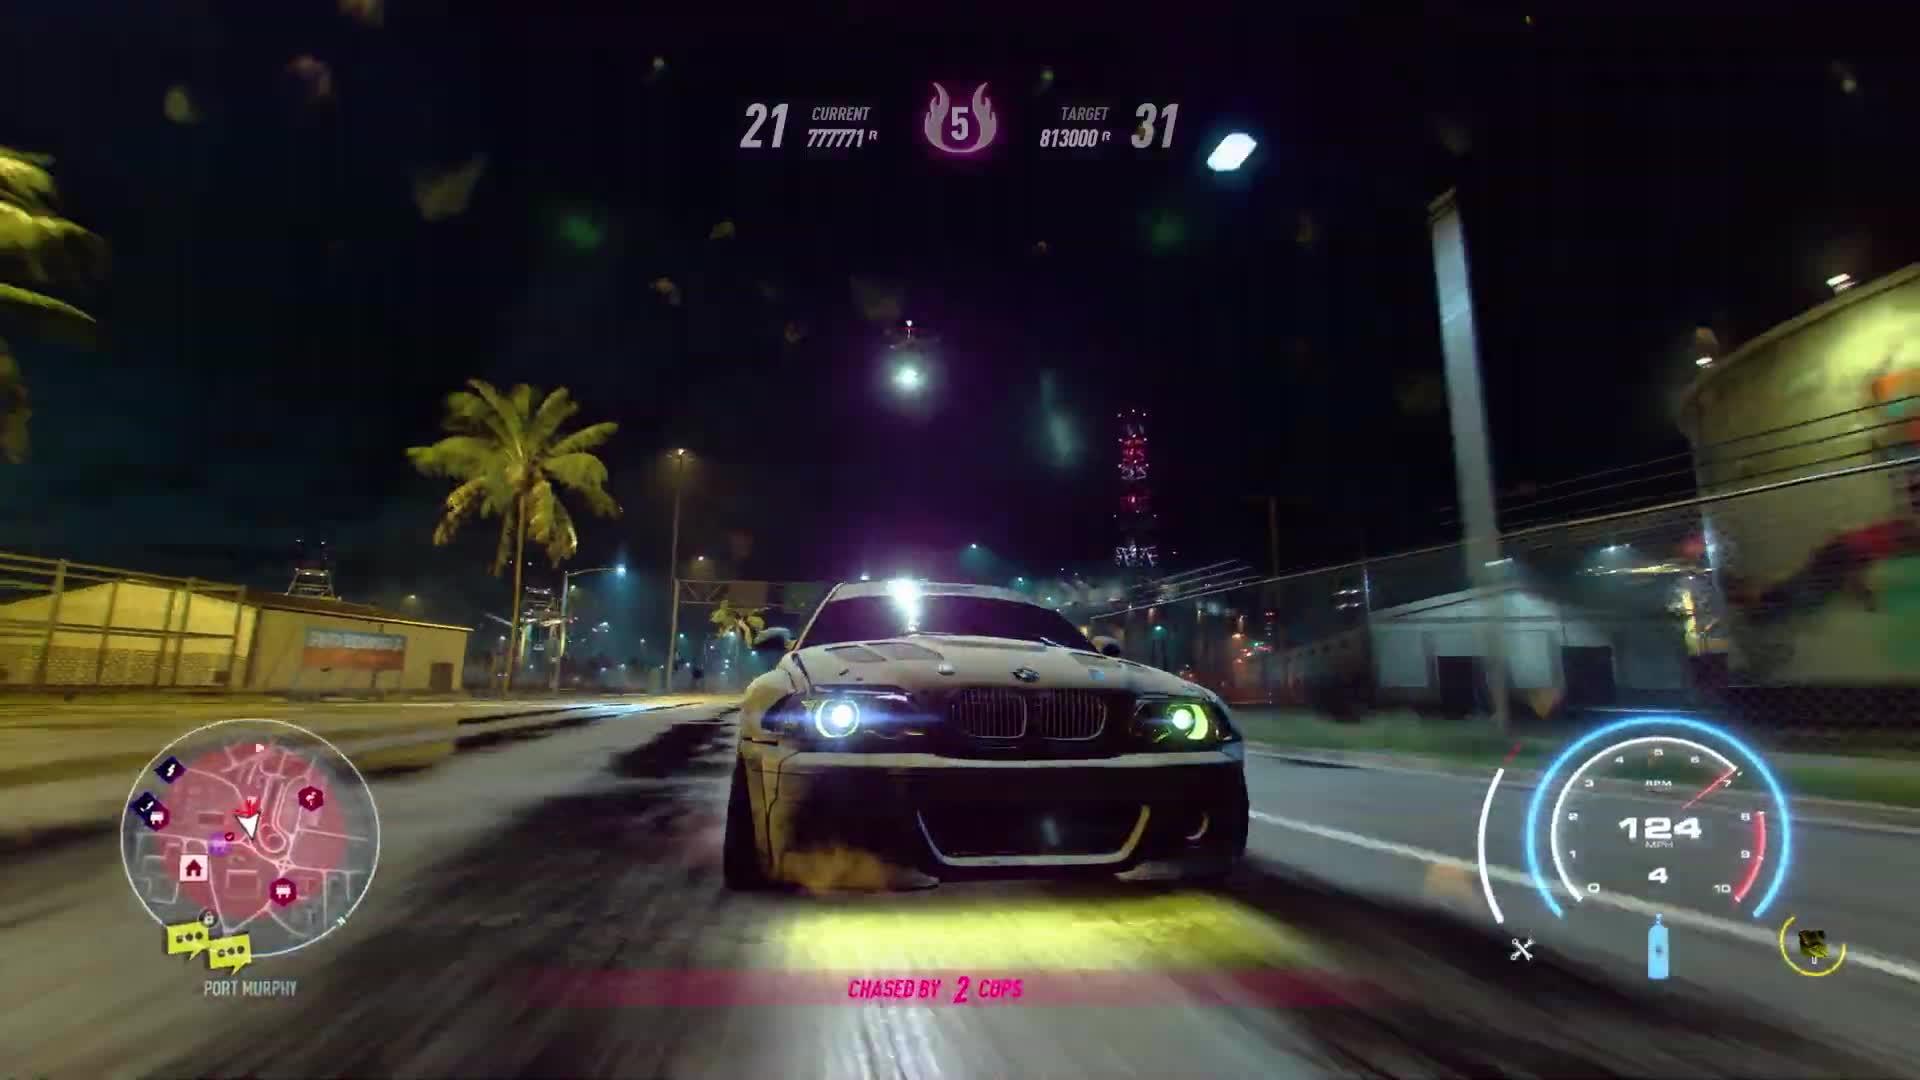 Trailer, Electronic Arts, Ea, Gameplay, Gamescom, Rennspiel, Need for Speed, gamescom 2019, Need for Speed Heat